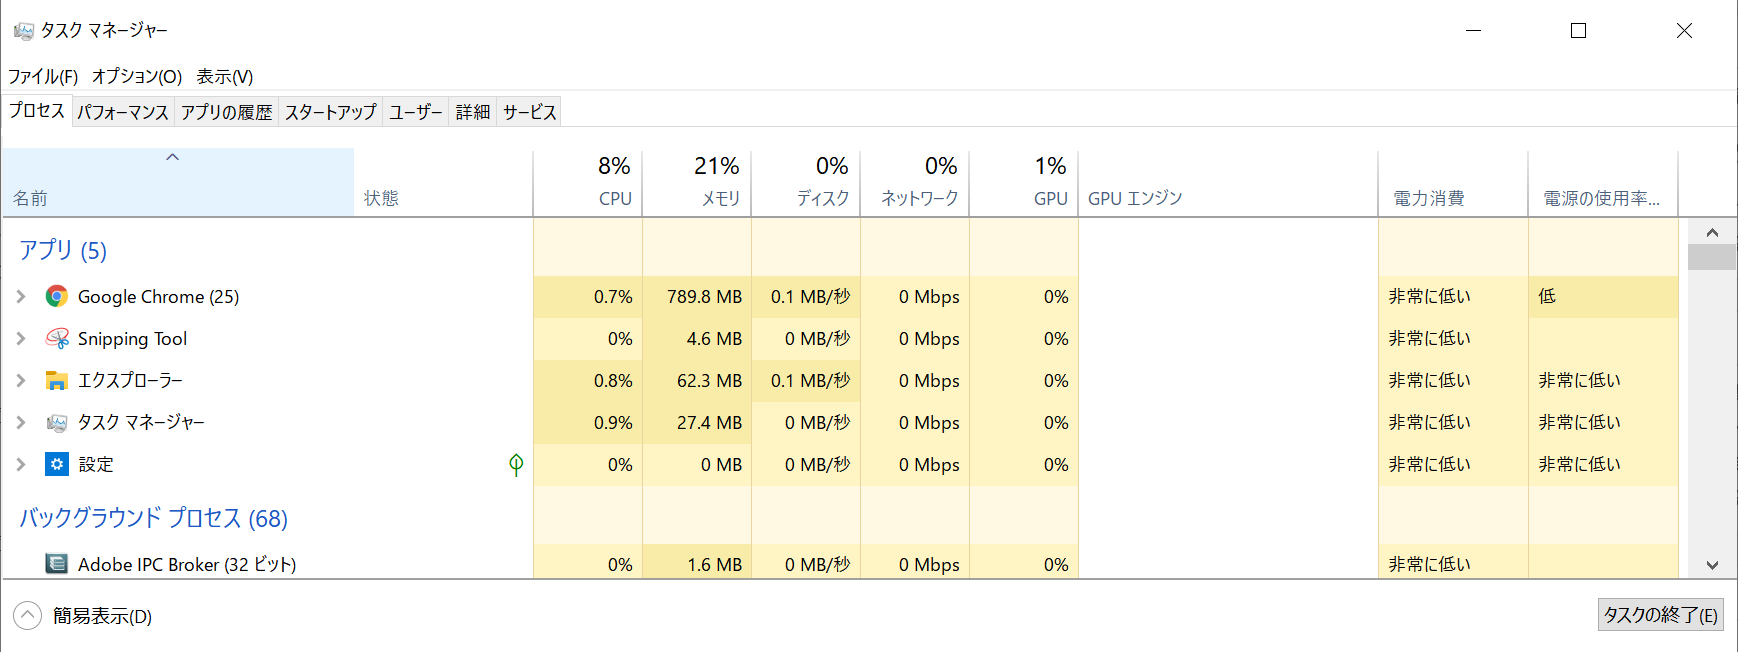 Windows 10でタスクマネージャーを簡易表示から詳細表示にする方法